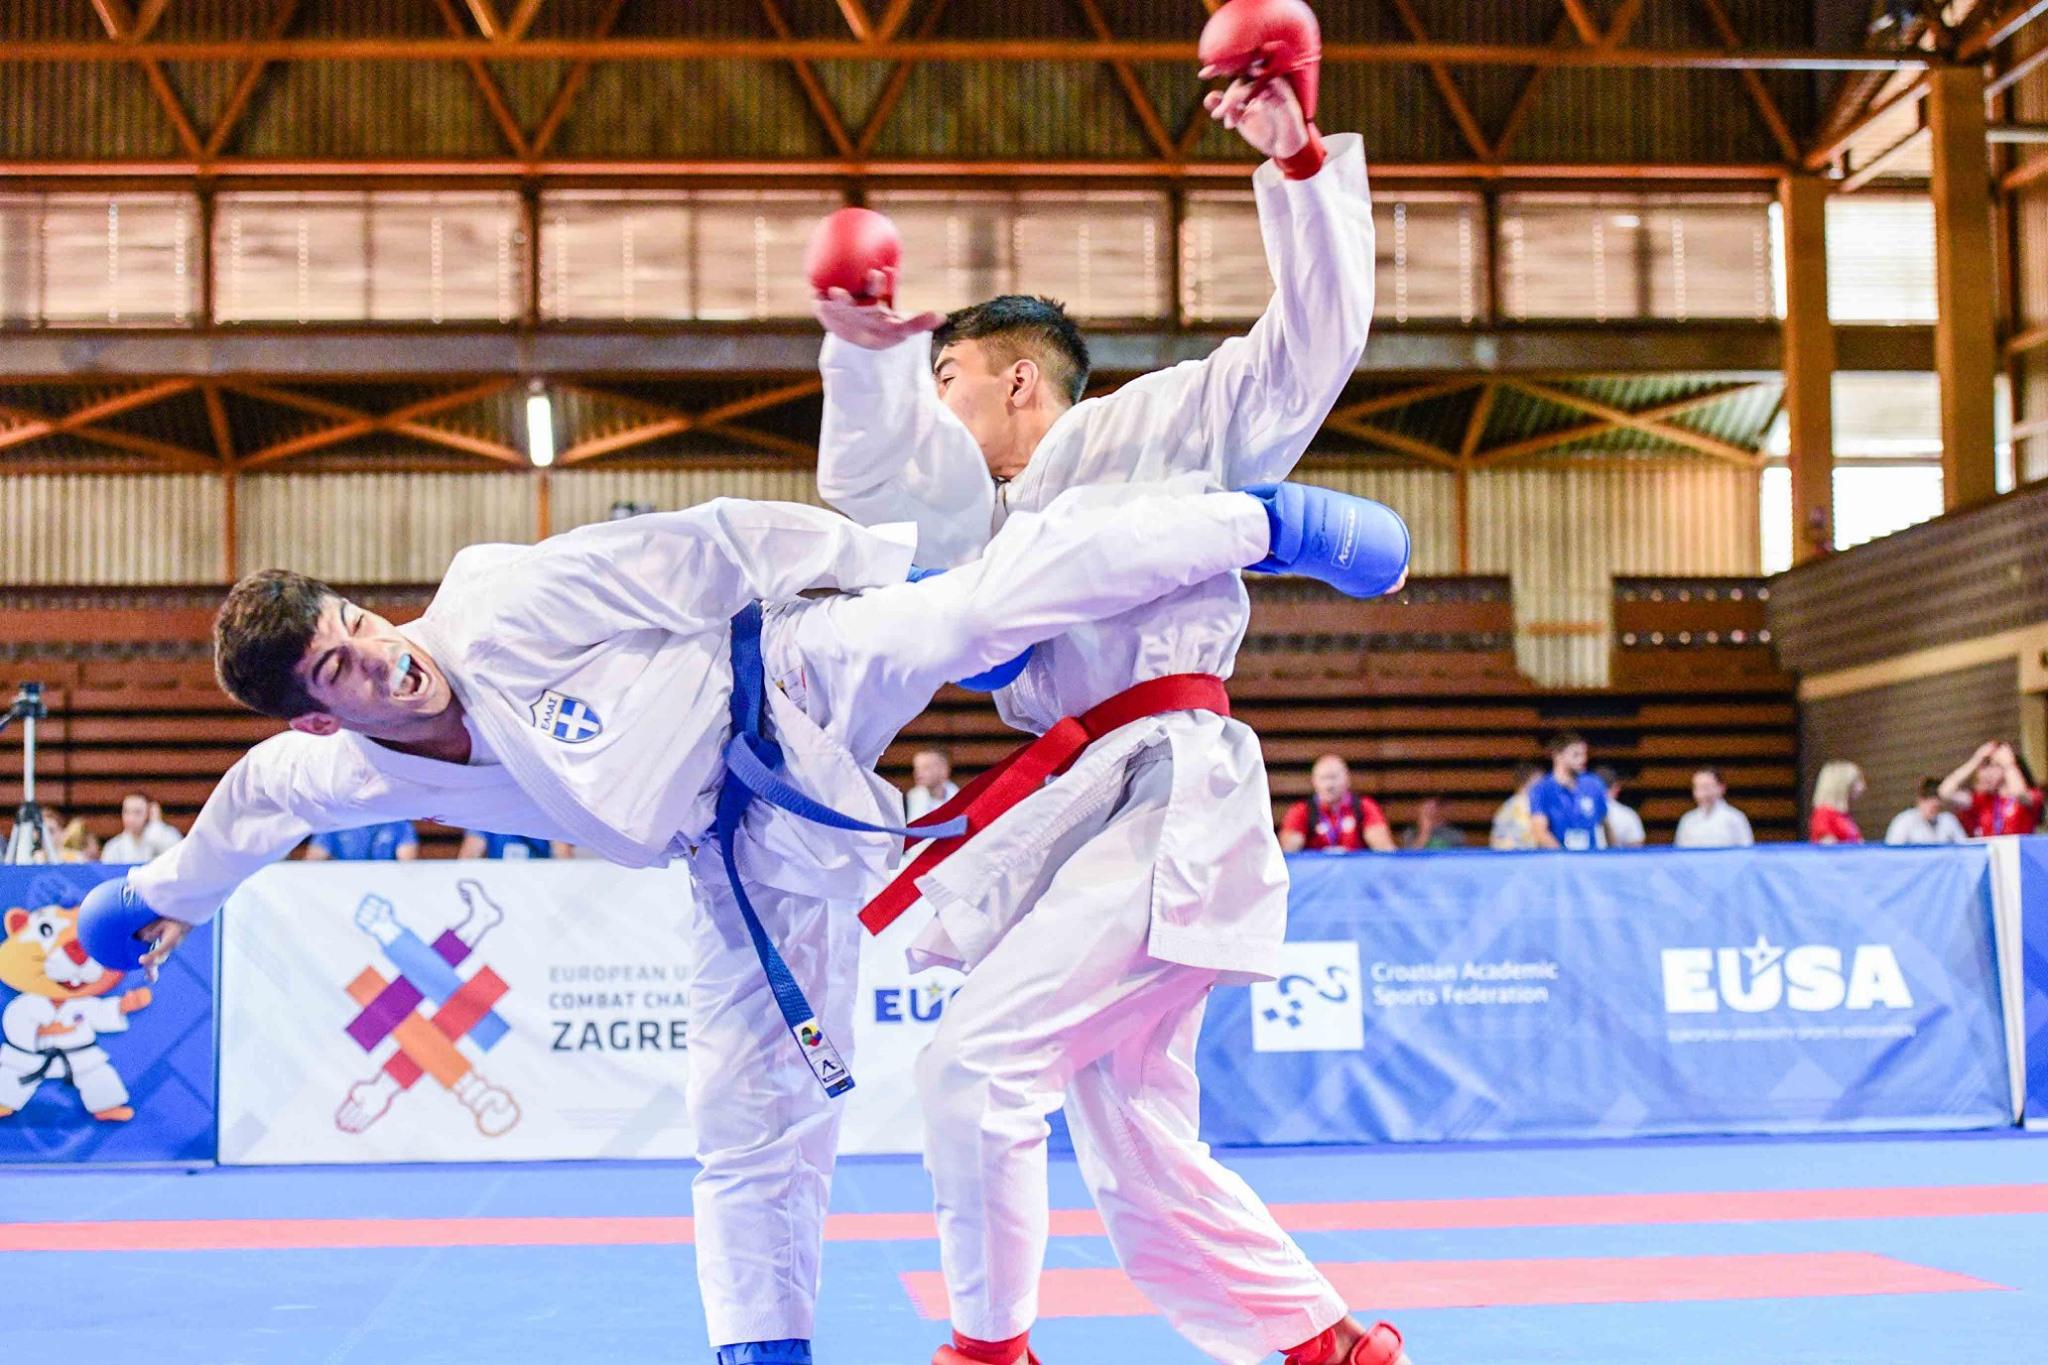 European Universities Karate Championship Eusa